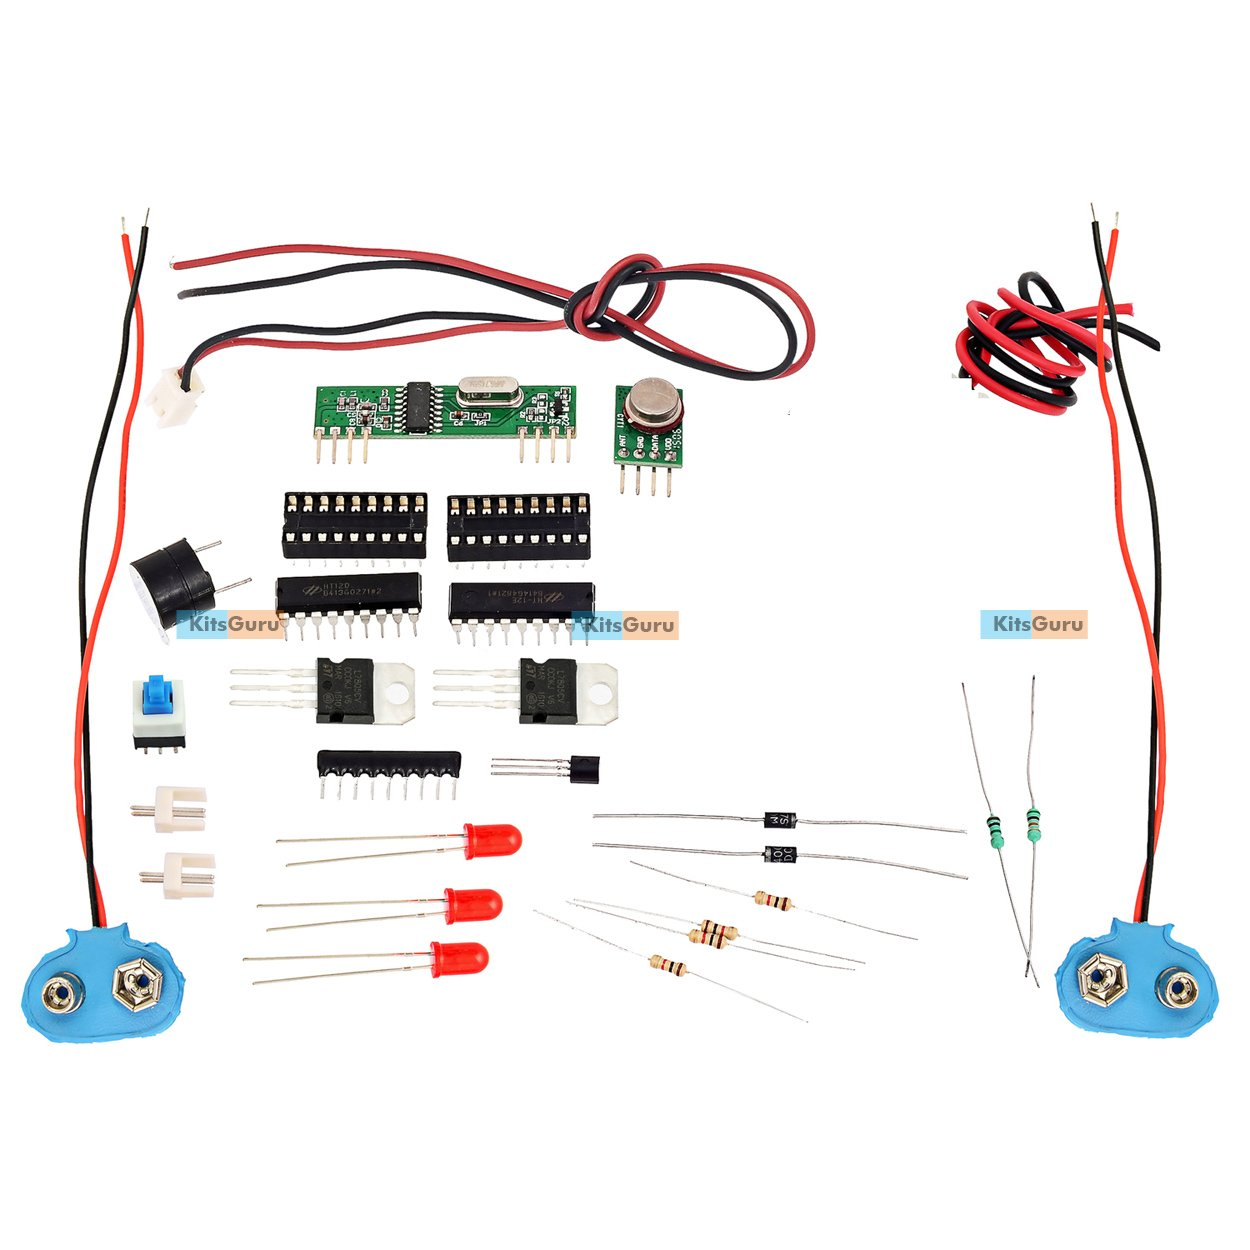 KitsGuru DIY Kit - Wireless Alarm Using Rf Module : Lgkt016